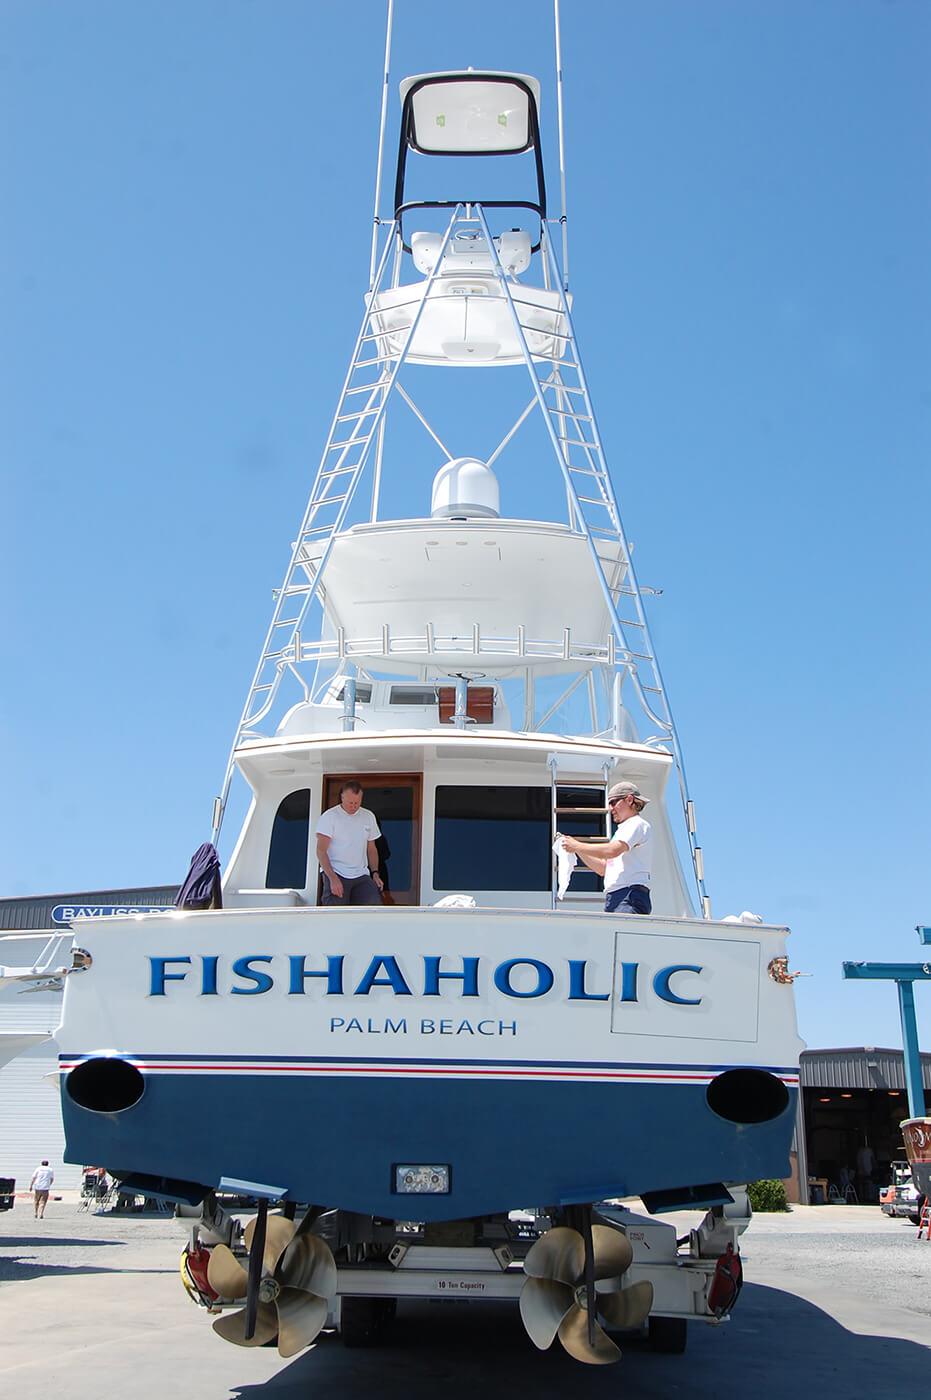 Fishaholic Palm Beach Florida Boat Transom